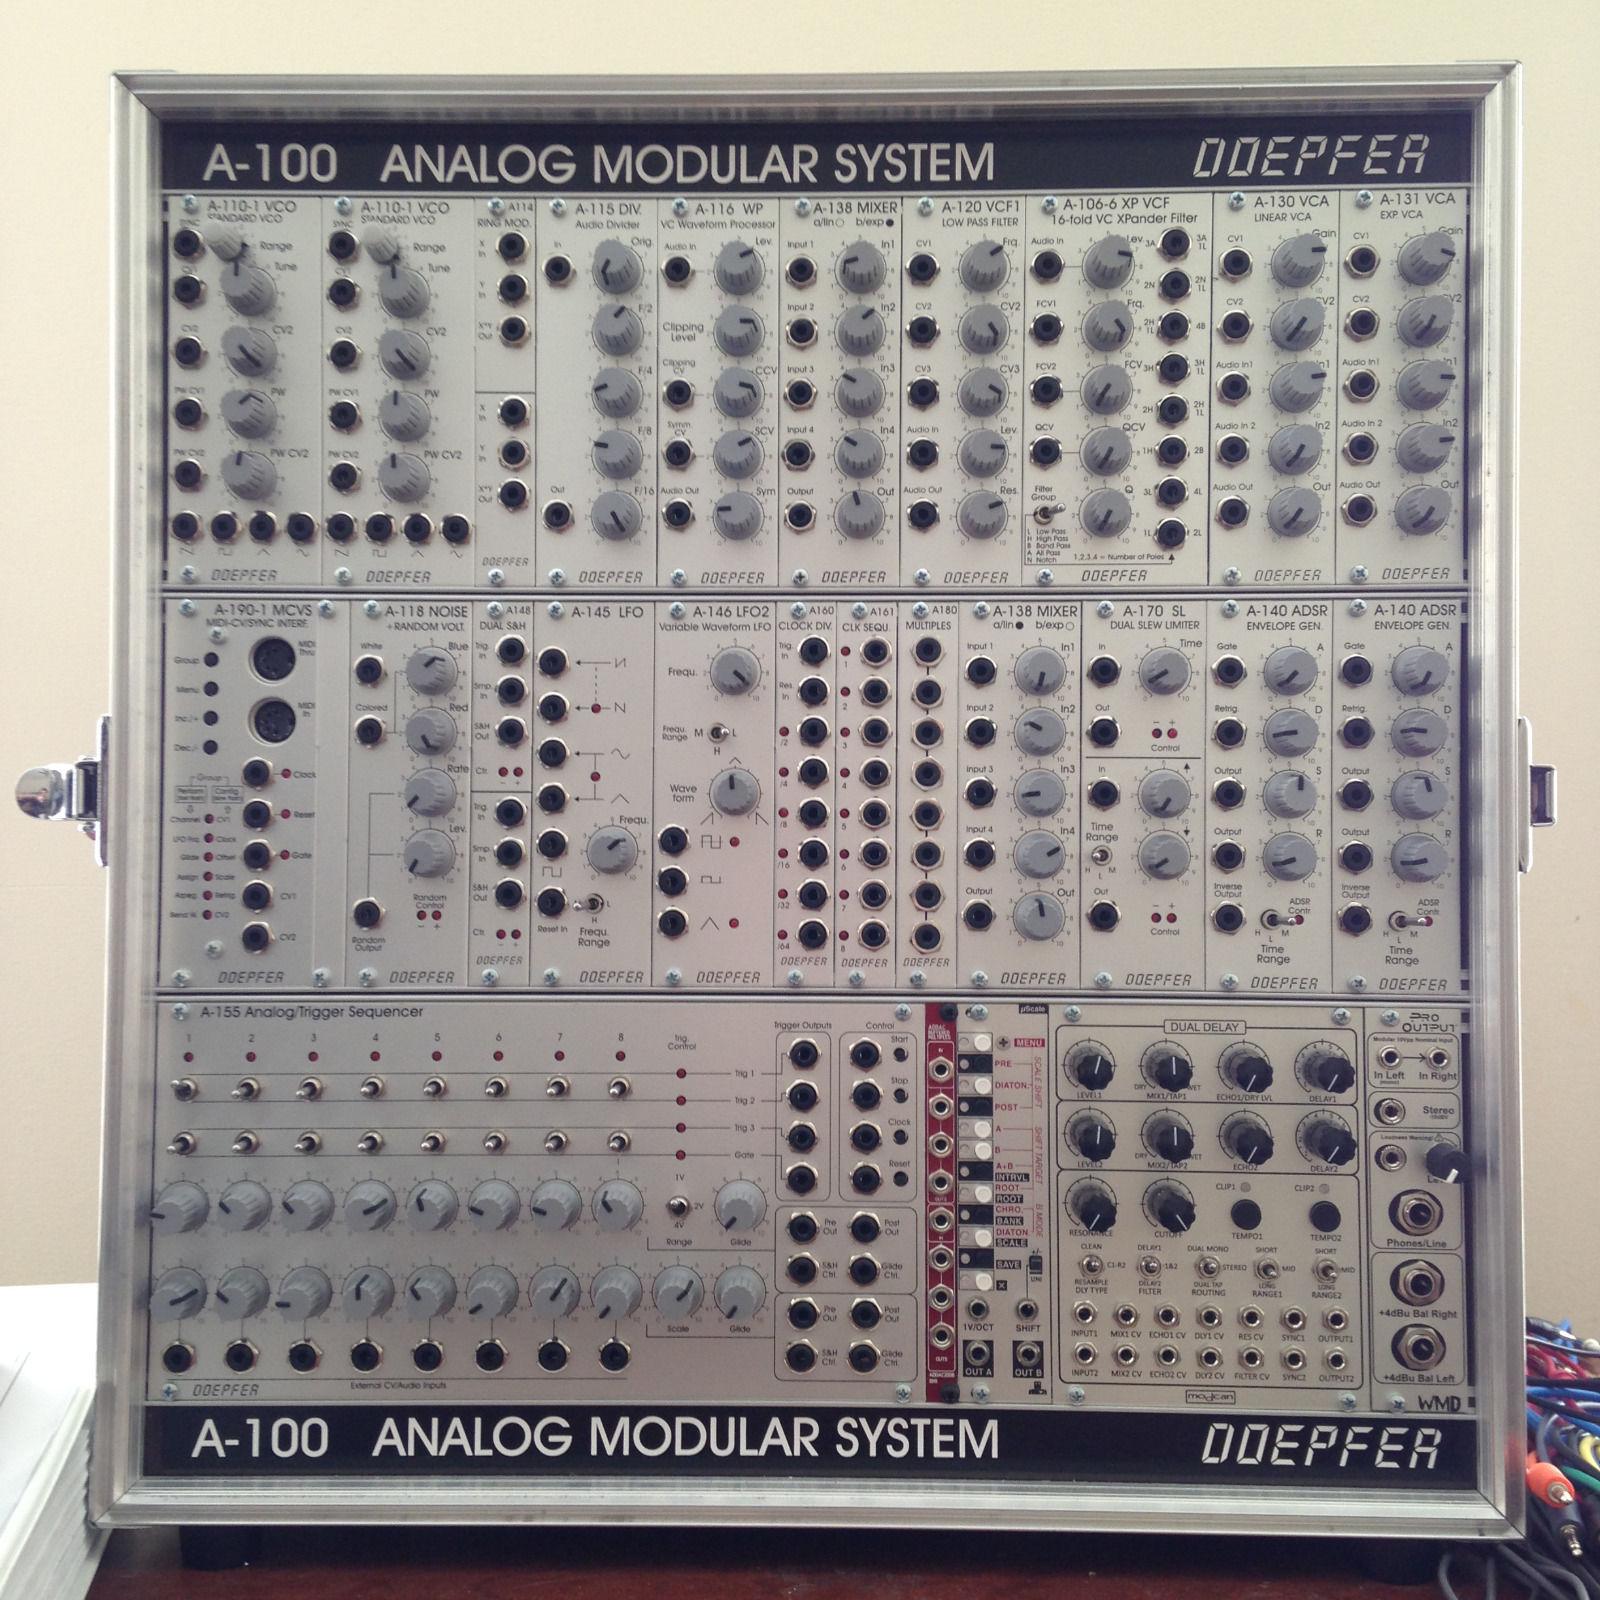 Matrixsynth Tuesday October 14 2014 Diabolical Circuit Bent Casio Sk1 Custom Modular Doepfer A 100 Eurorack Analog Synthesizer With Extras